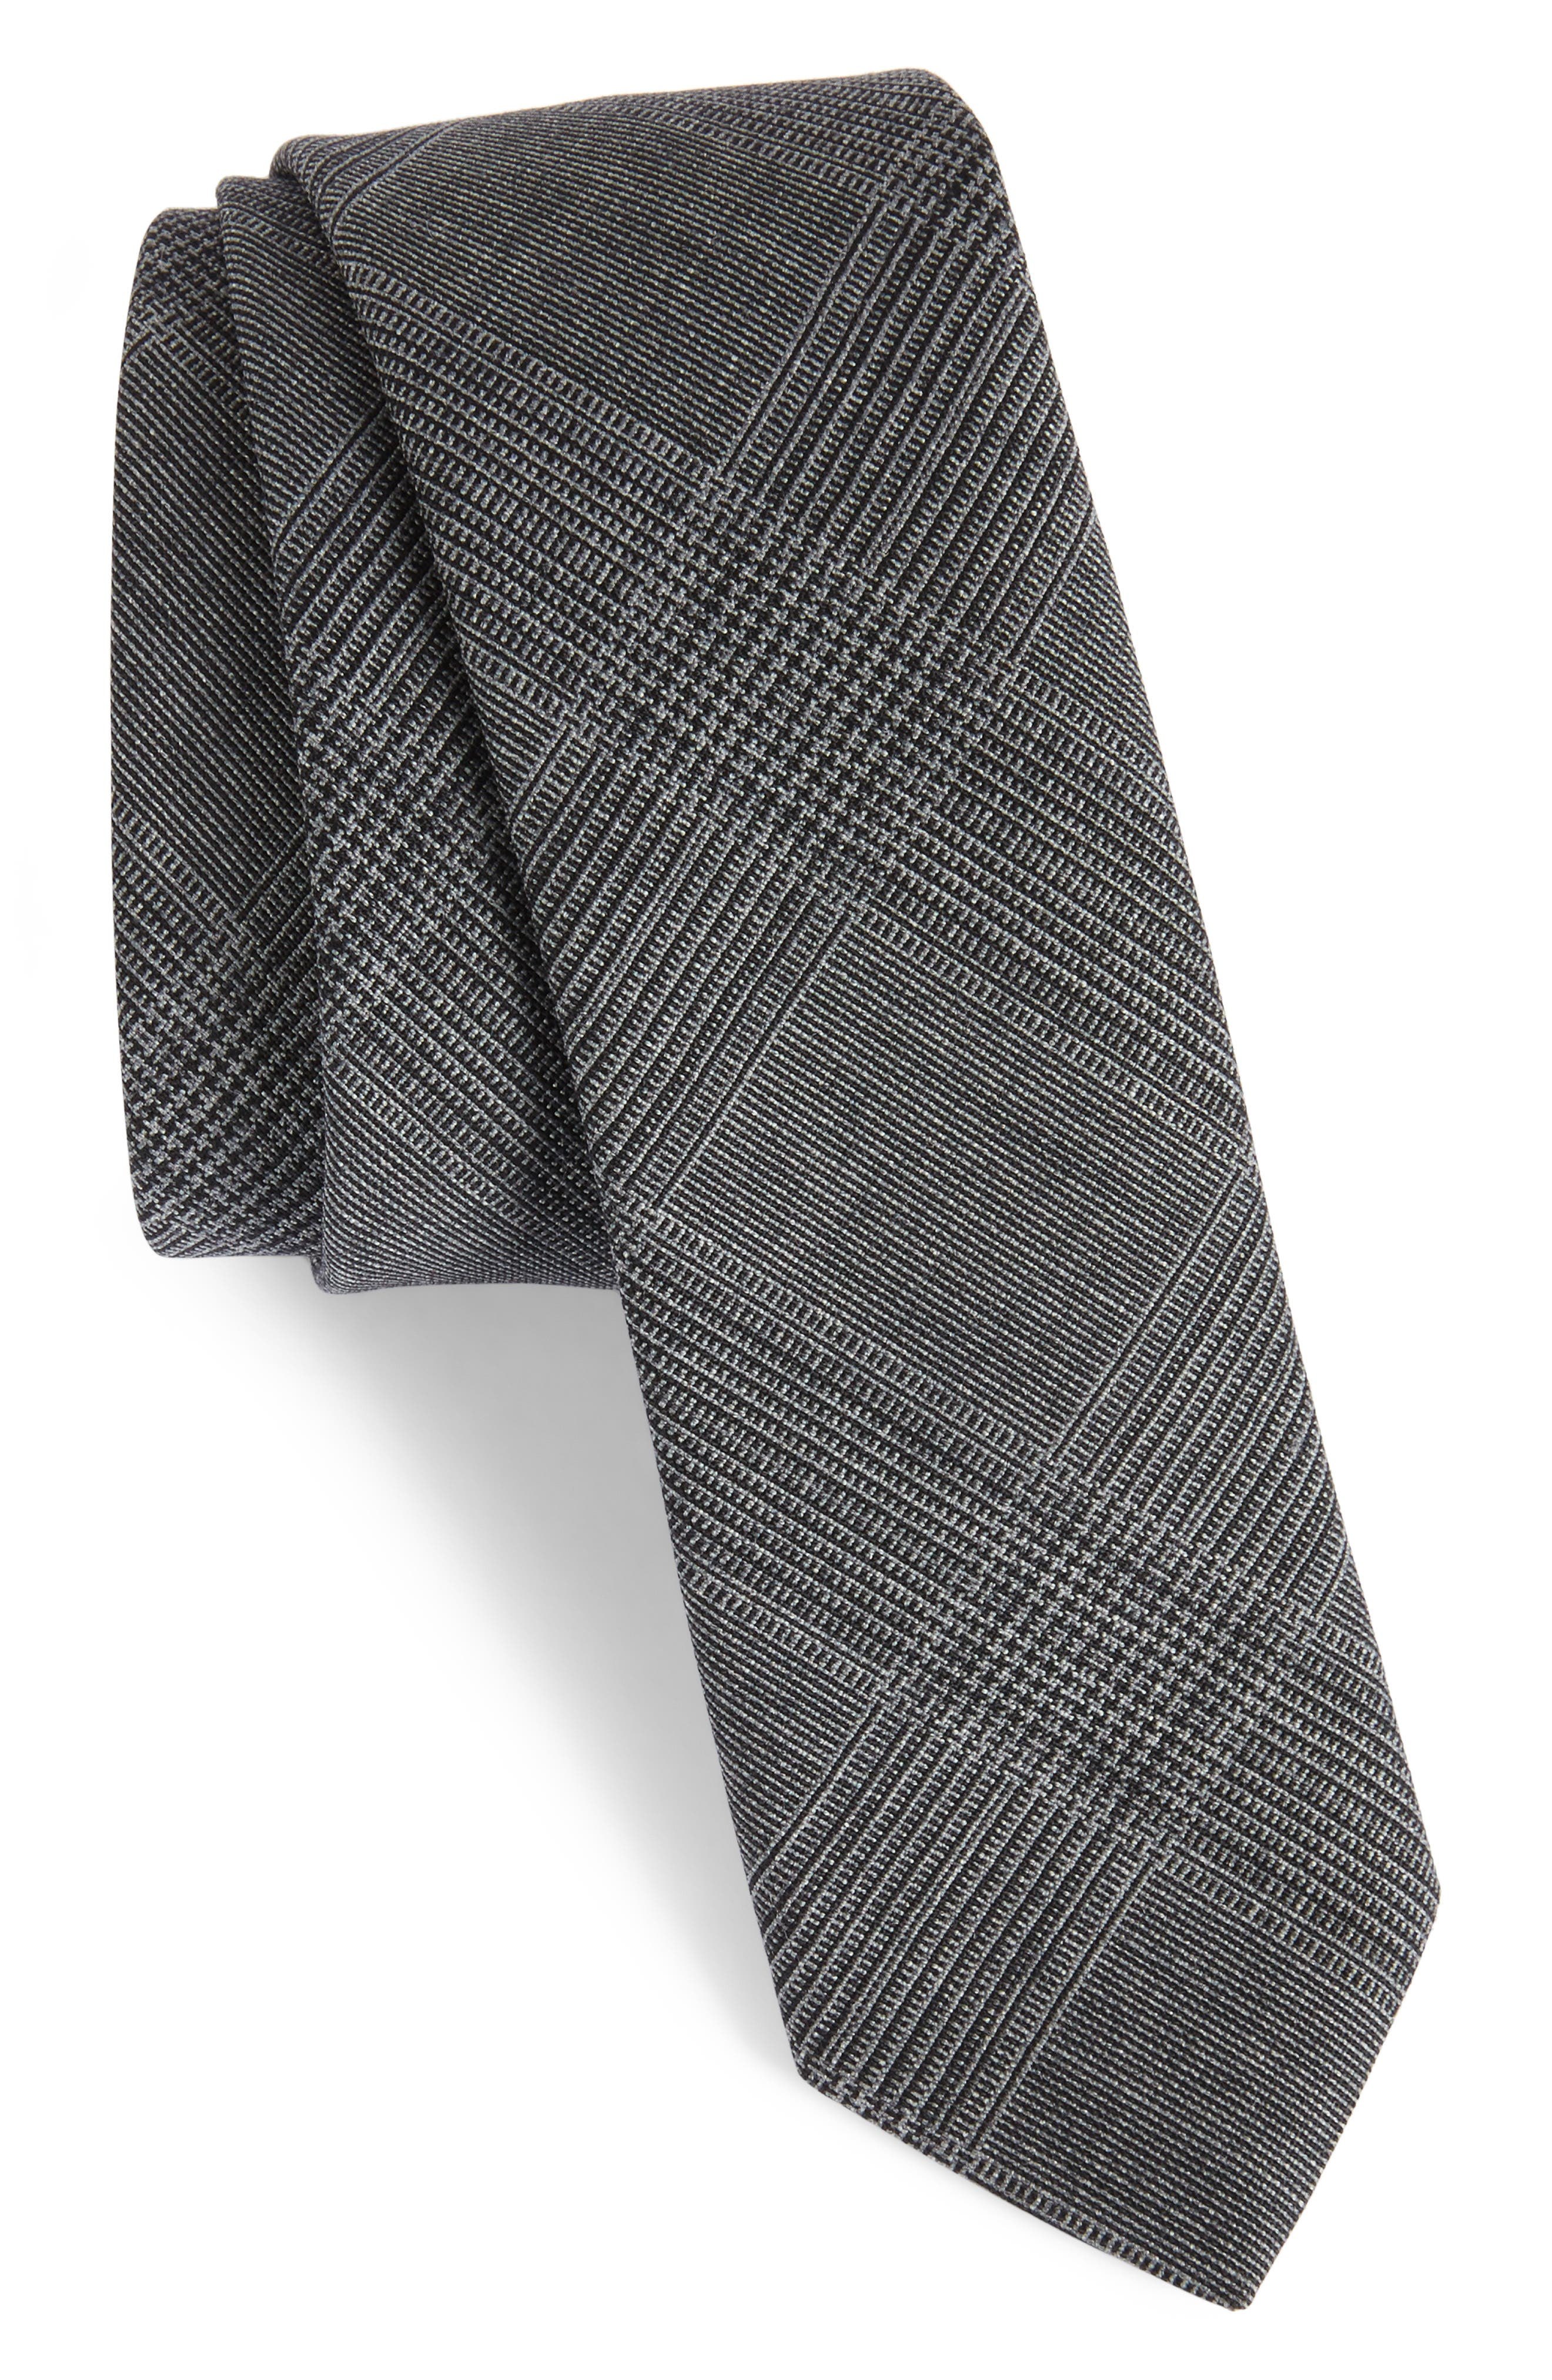 Glen Plaid Wool Skinny Tie,                         Main,                         color, Charcoal